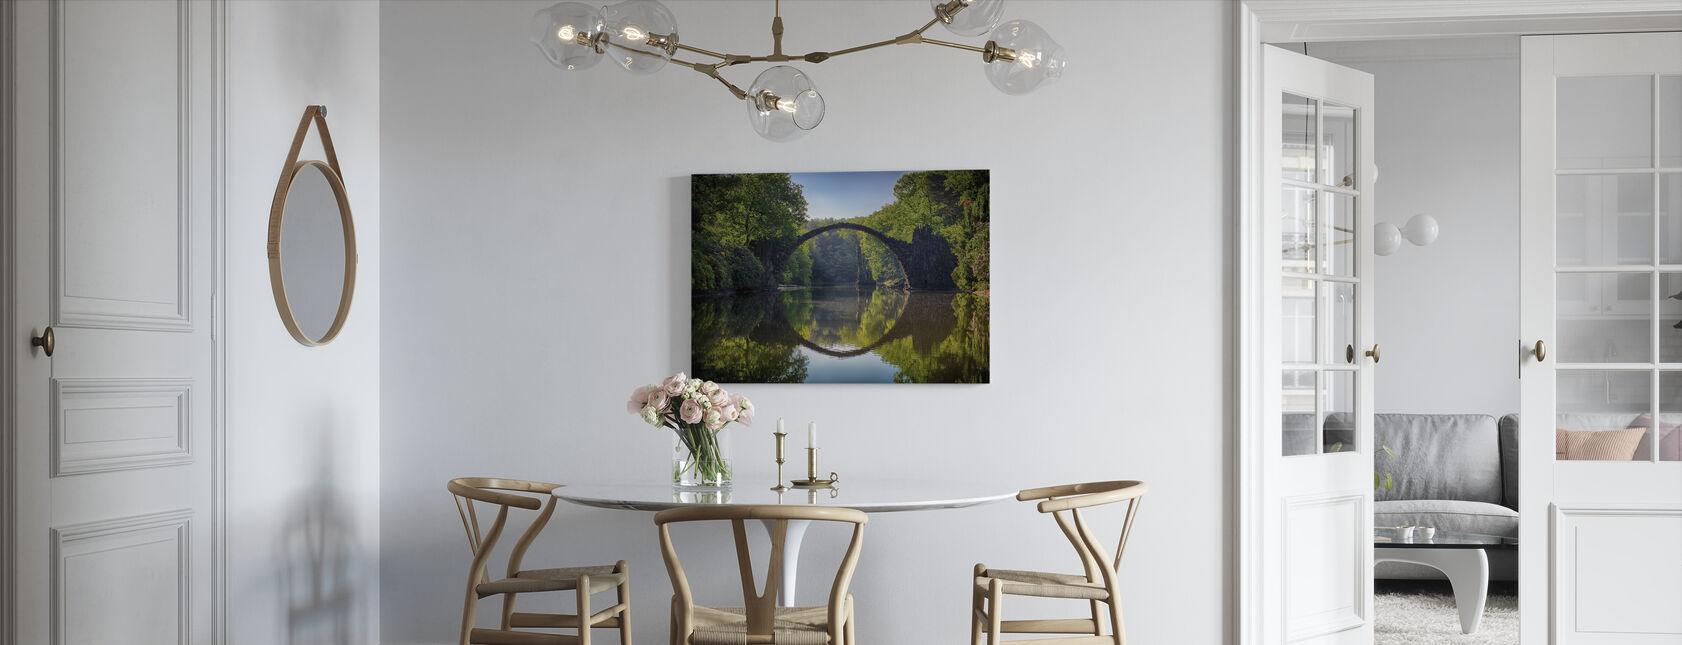 Bogenbrücke - Leinwandbild - Küchen